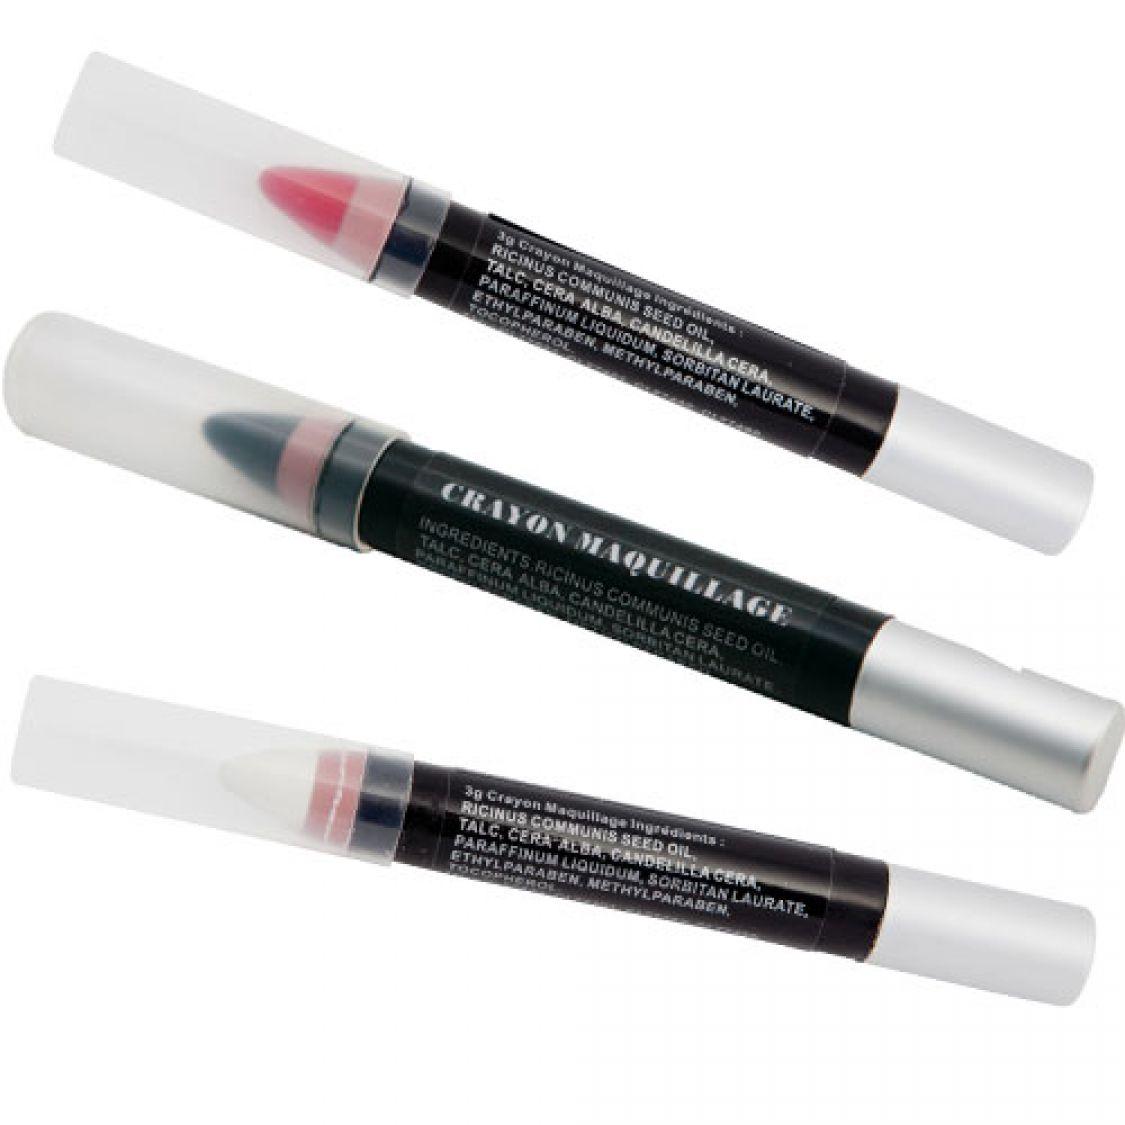 crayon maquillage 3 coloris. Black Bedroom Furniture Sets. Home Design Ideas